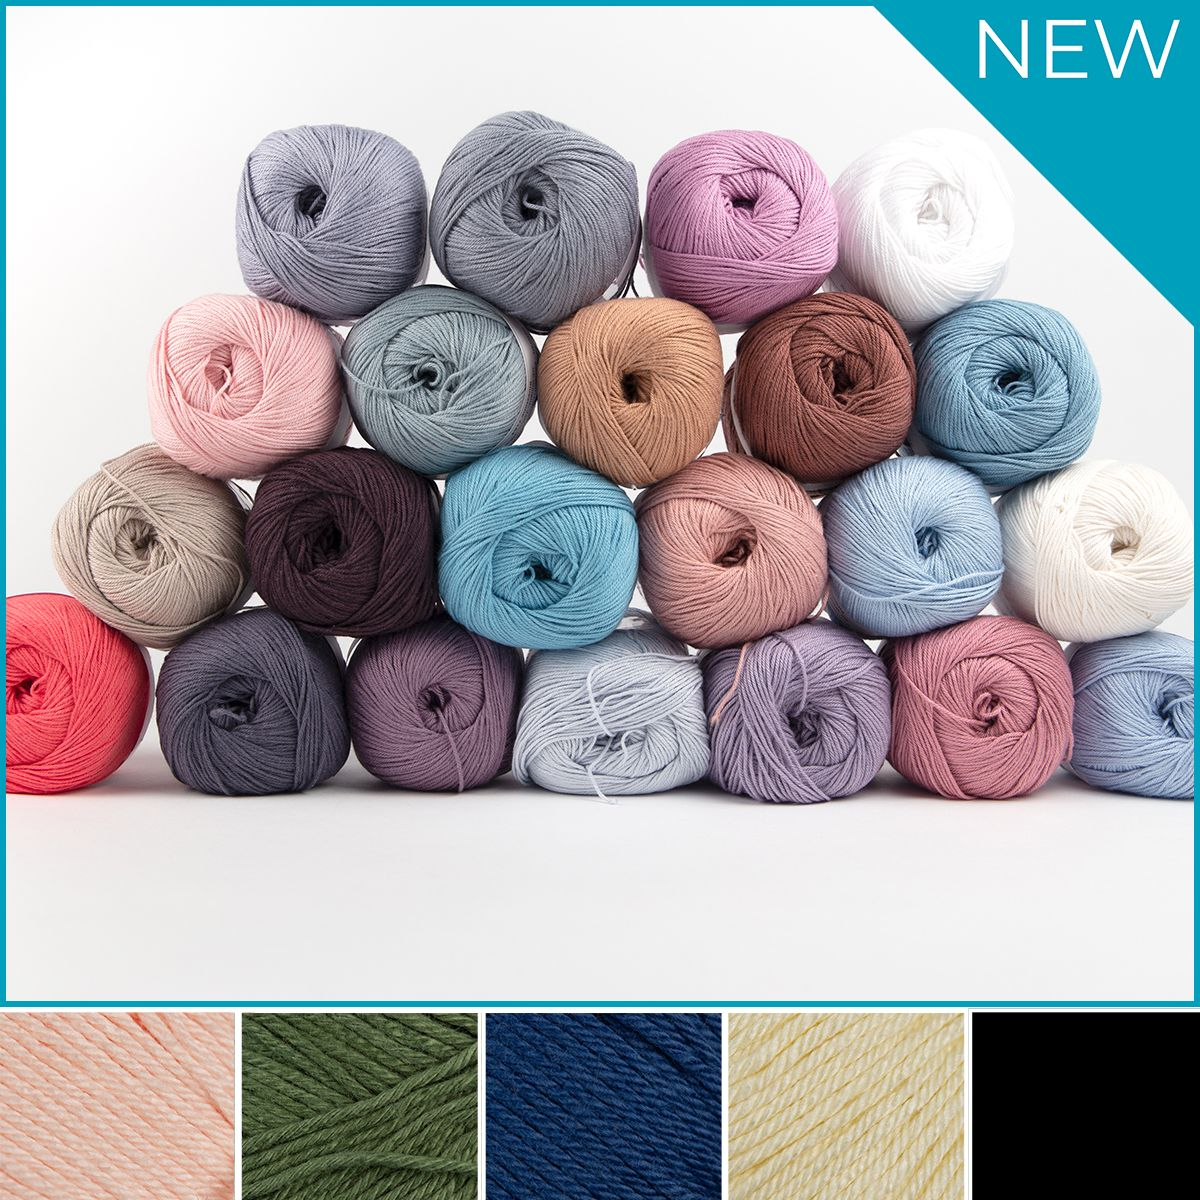 Stylecraft Naturals Bamboo And Cotton In 2020 Yarn Shop Yarn Inspiration Stylecraft